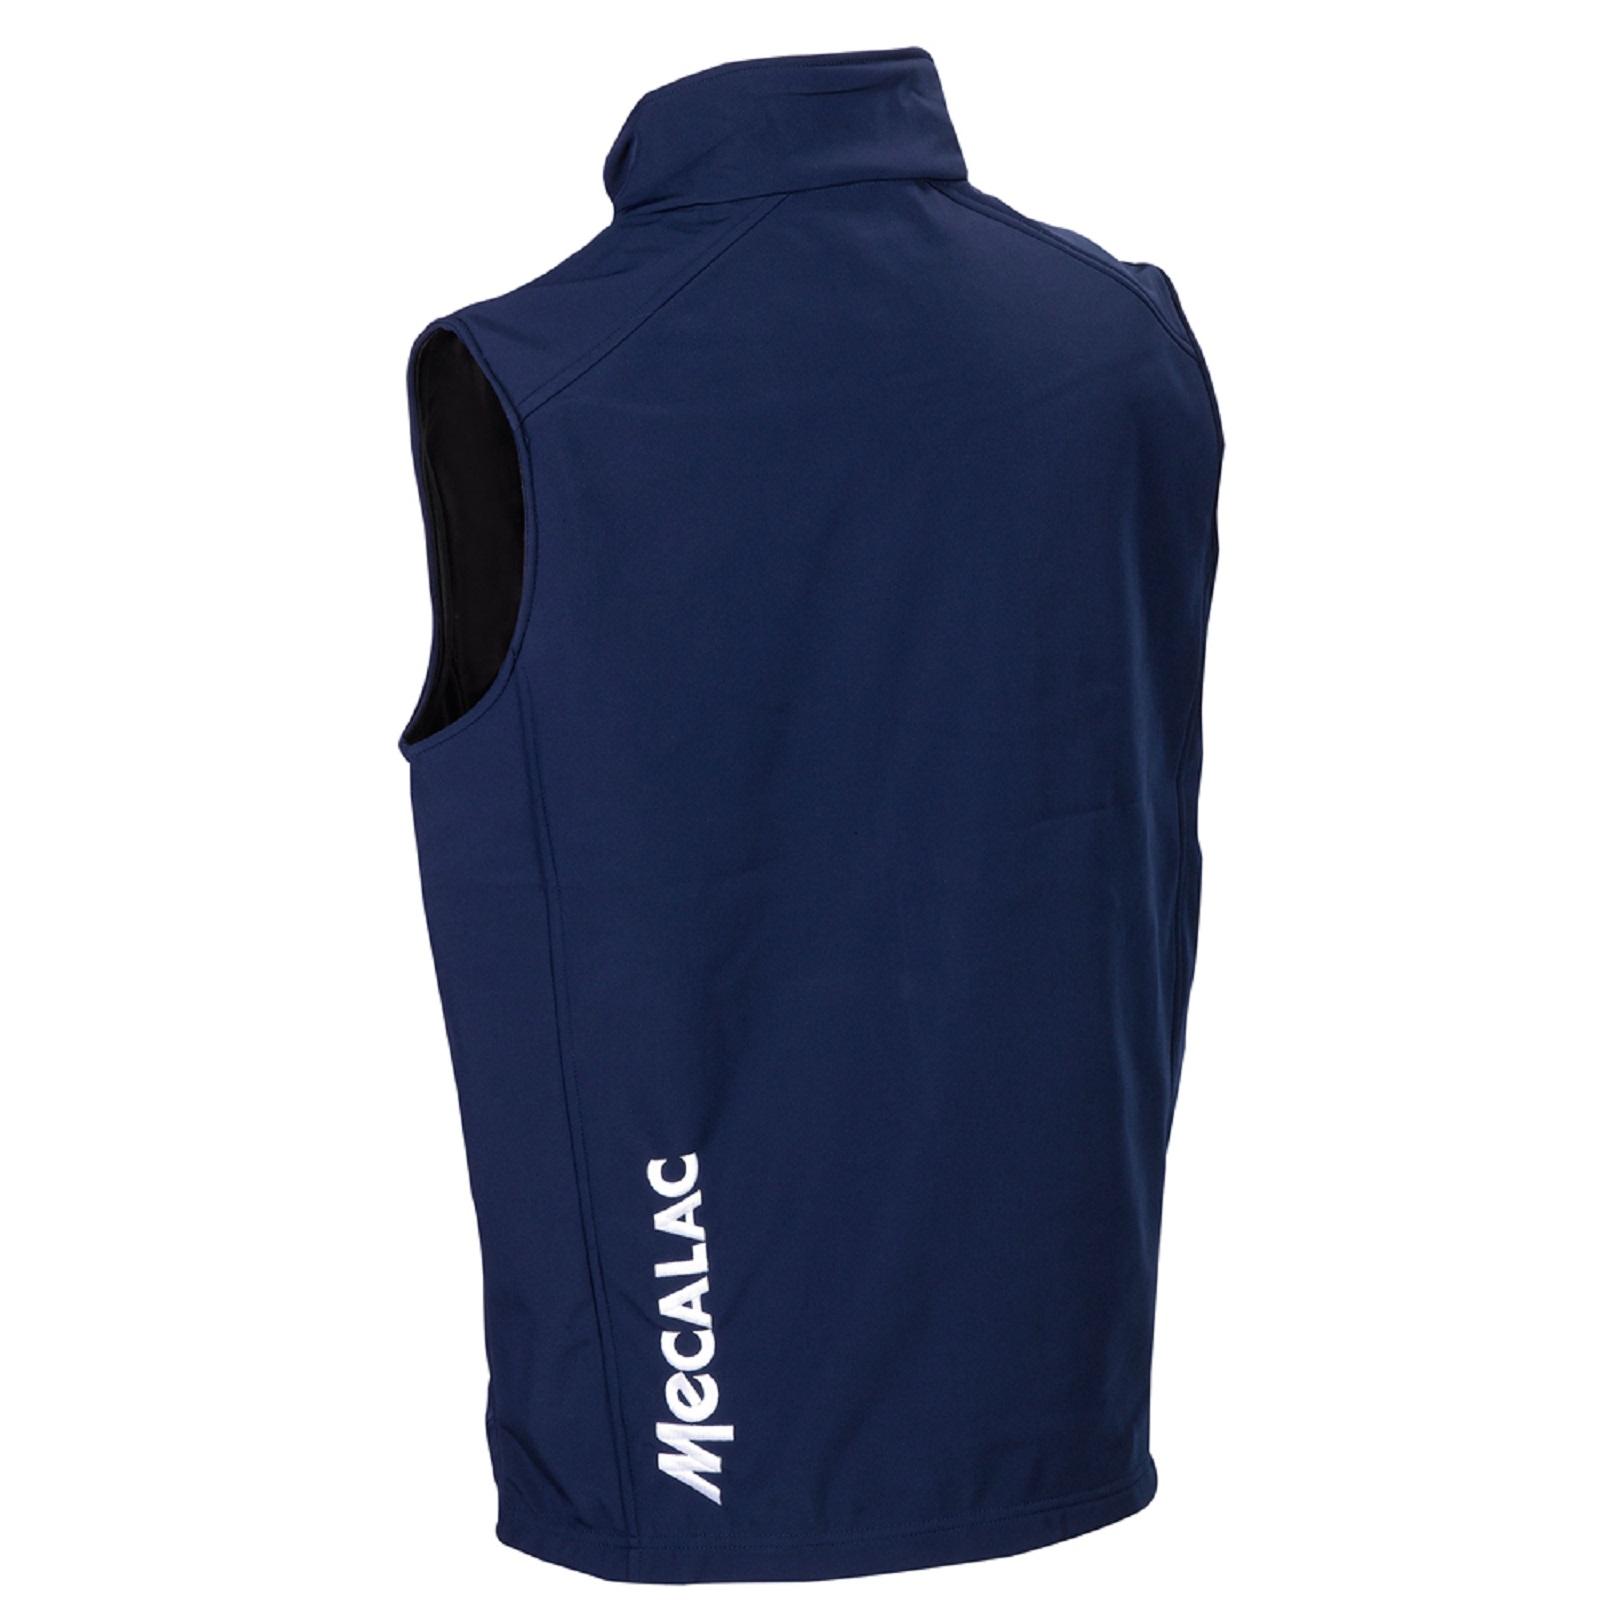 Bodywarmer Jacket